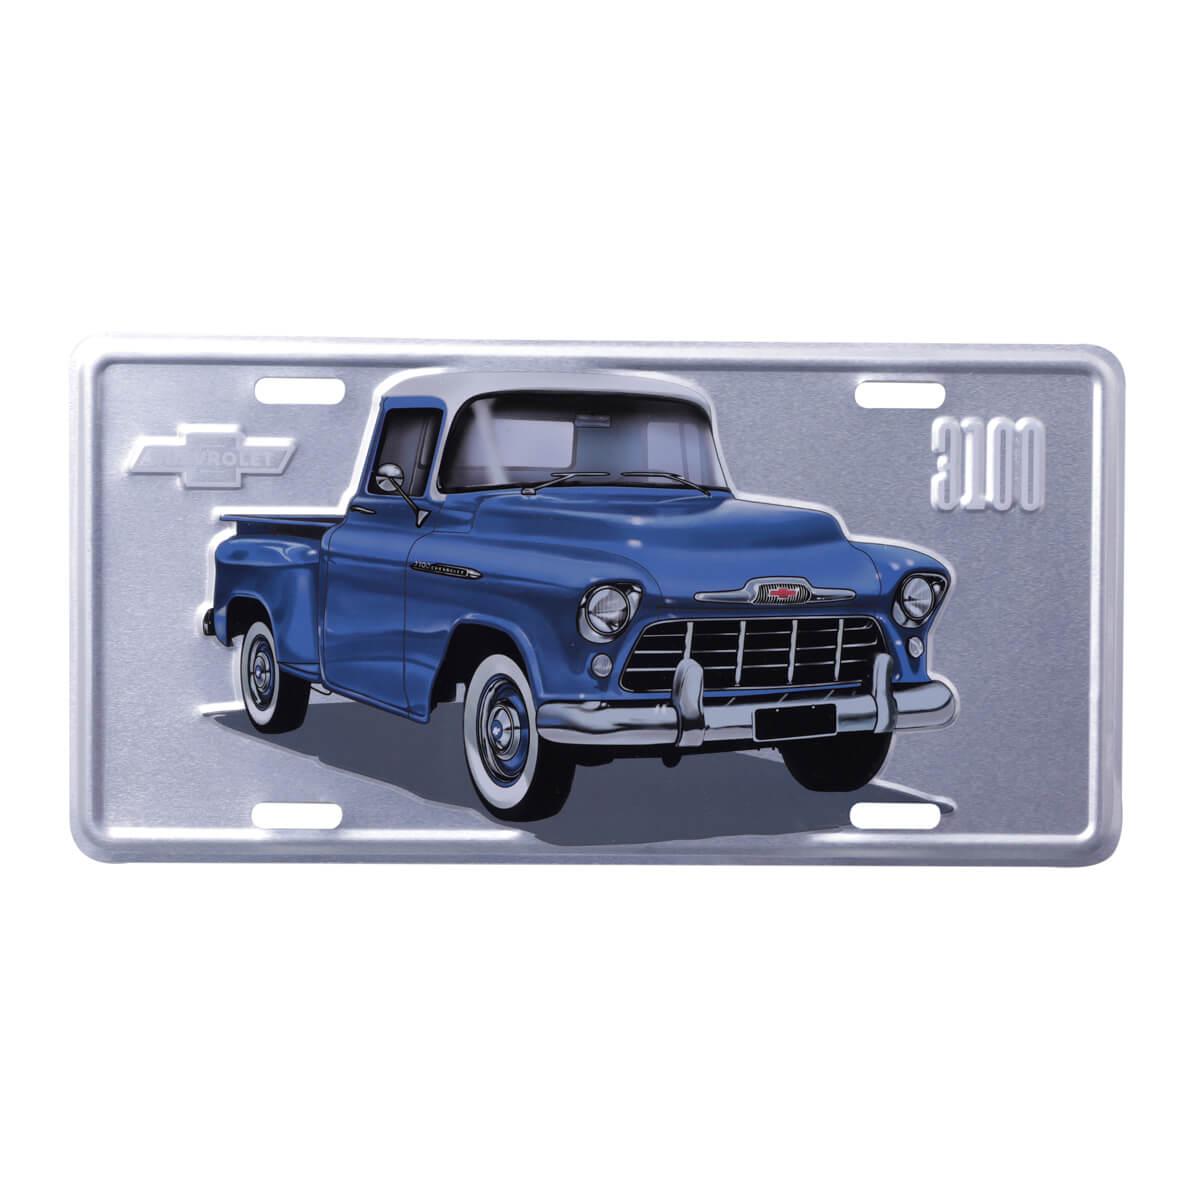 Placa de Alumínio Chevrolet - Pick up 3100 - Prata / Azul